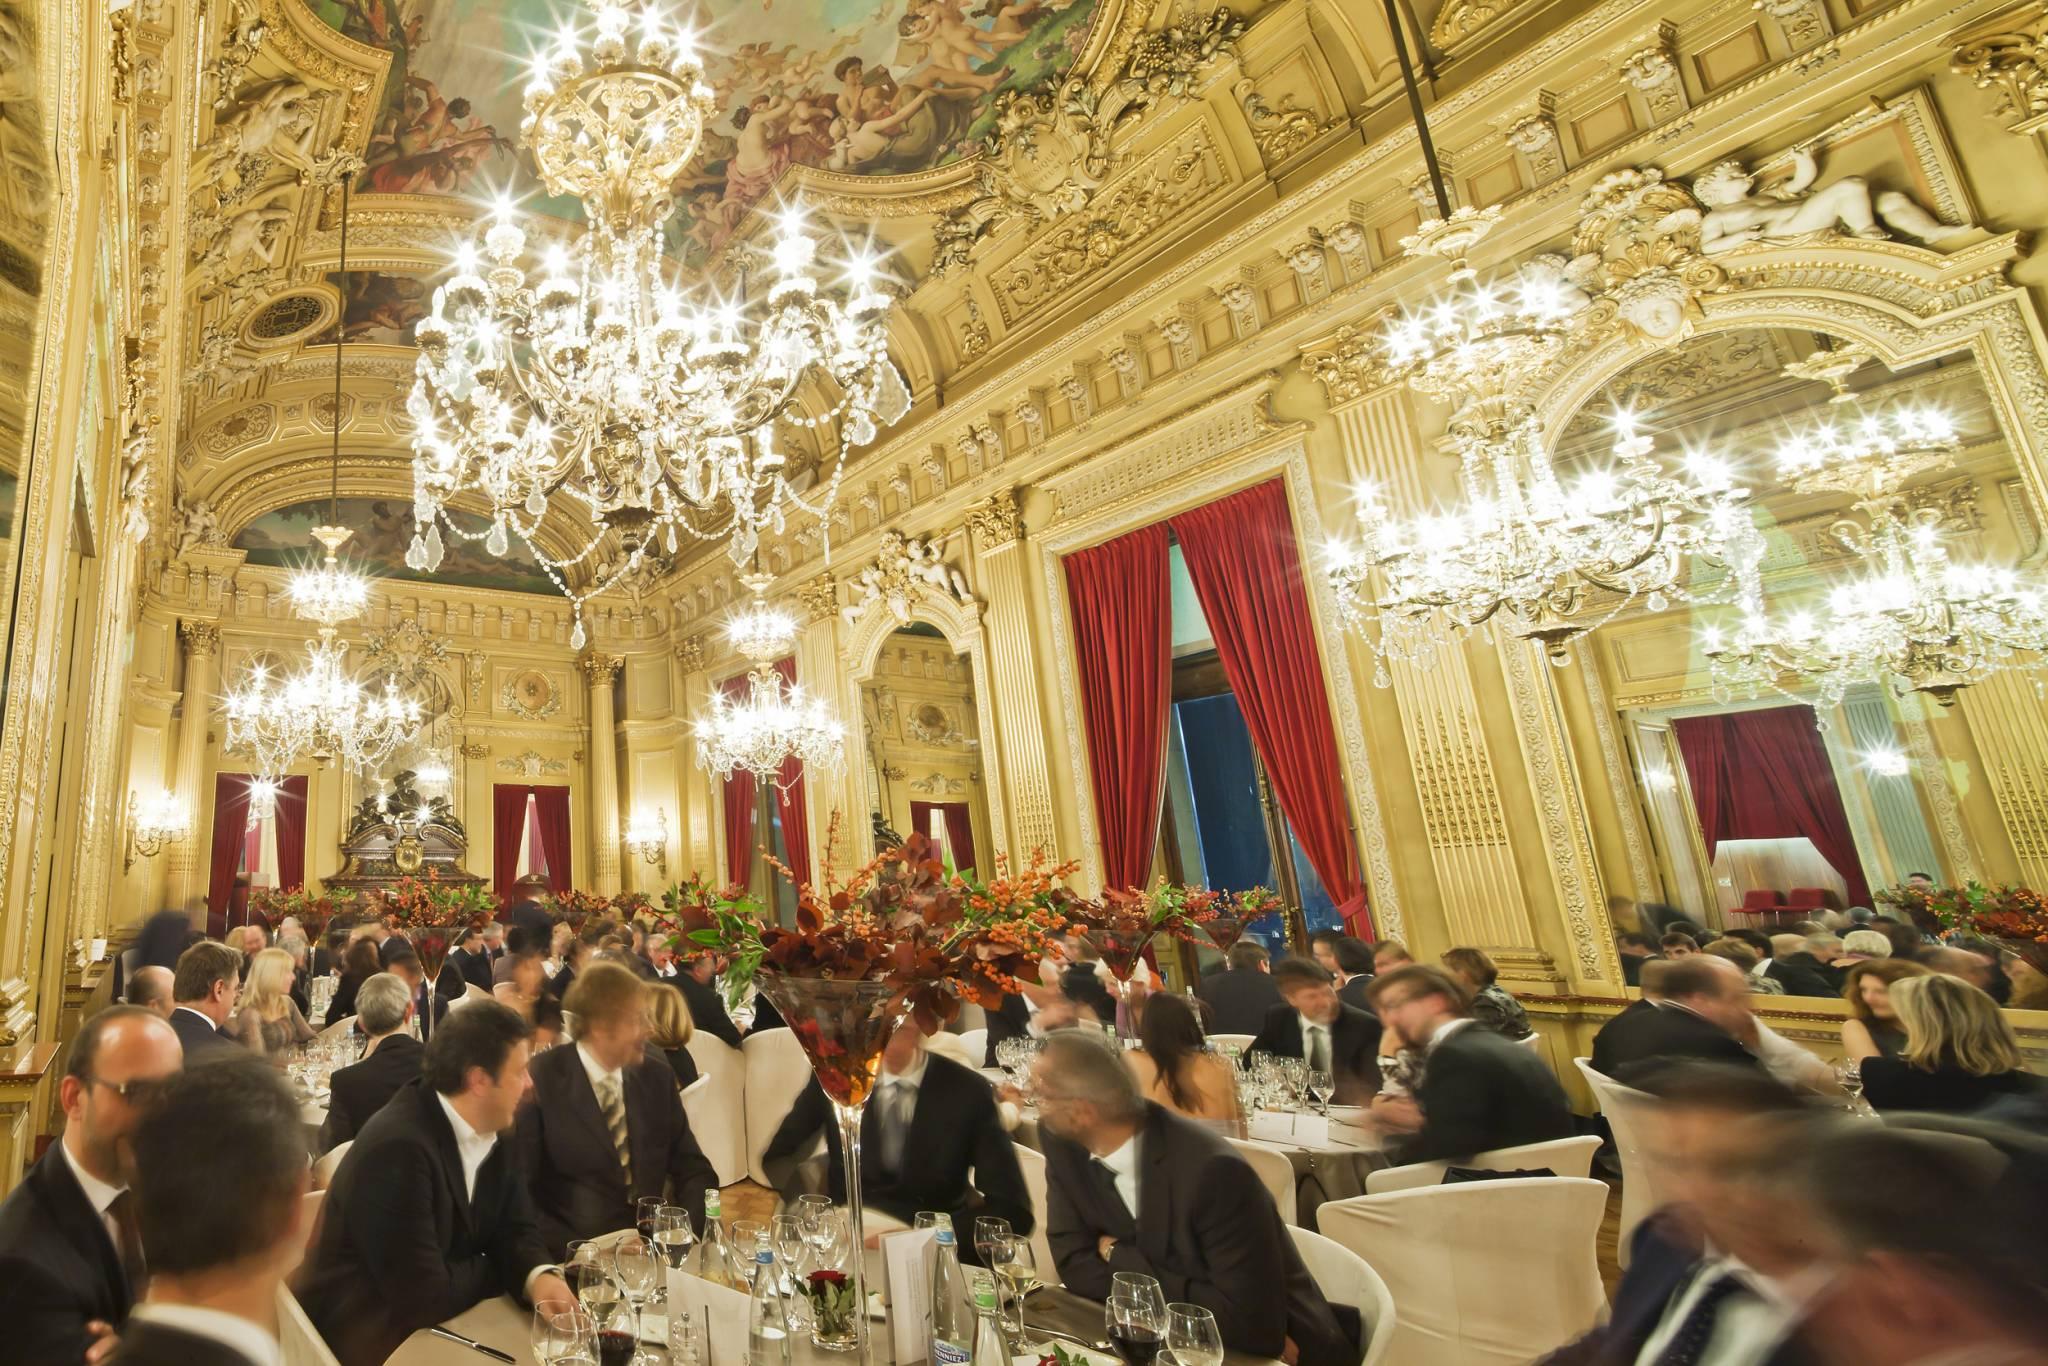 Gala dinner in the lobby of the Geneva Grand Théâtre, November 19th, 2011